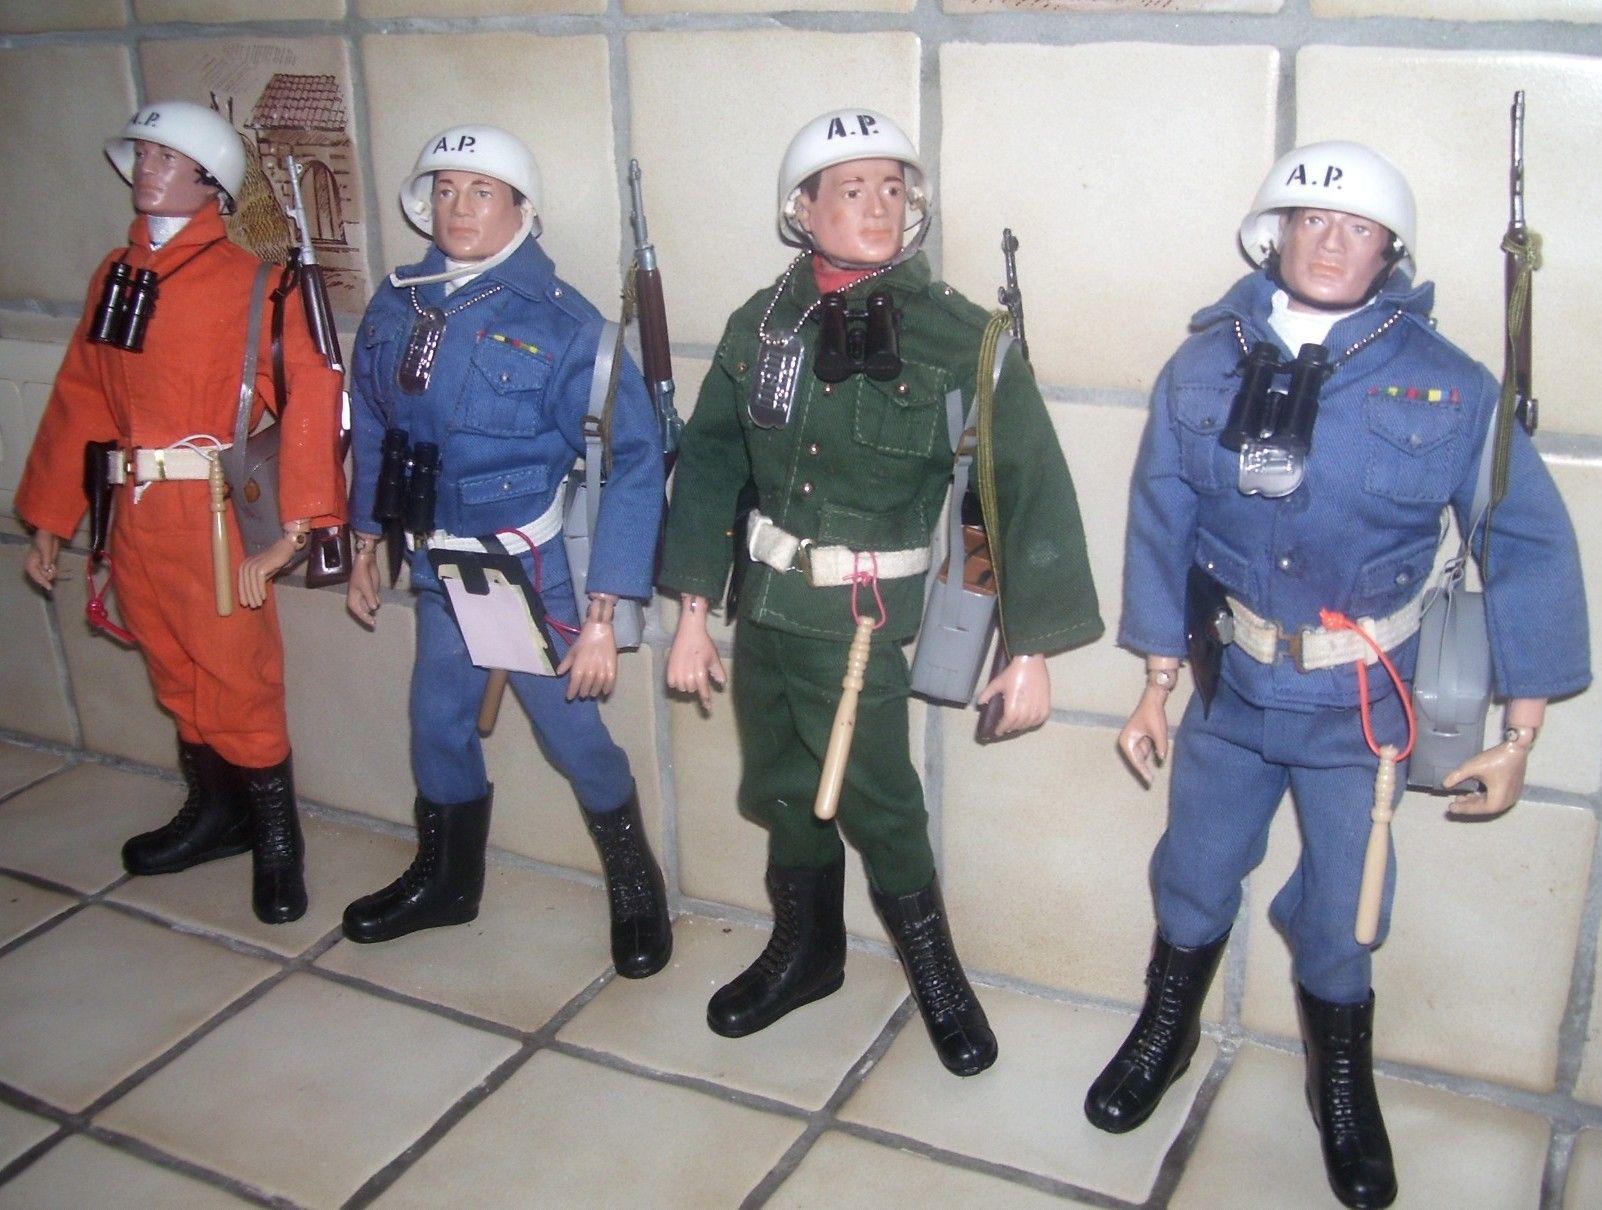 Air Police Winter Jackets Gi Joe Canada Goose Jackets